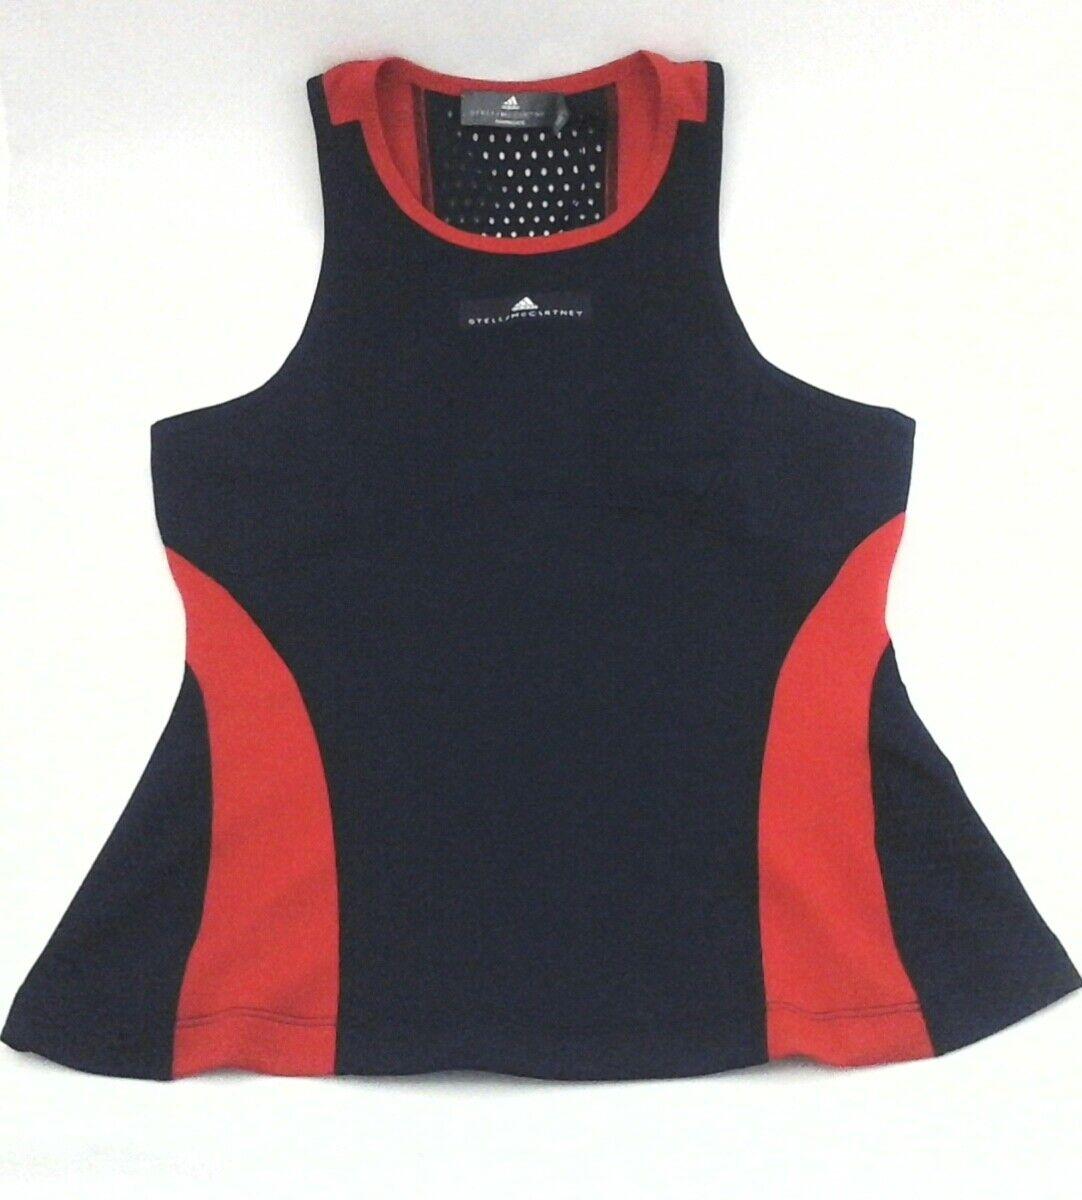 ADIDAS Stella McCartney Tennis Tank Q4 Barricade bluee Red CY1919 Women's  70 New